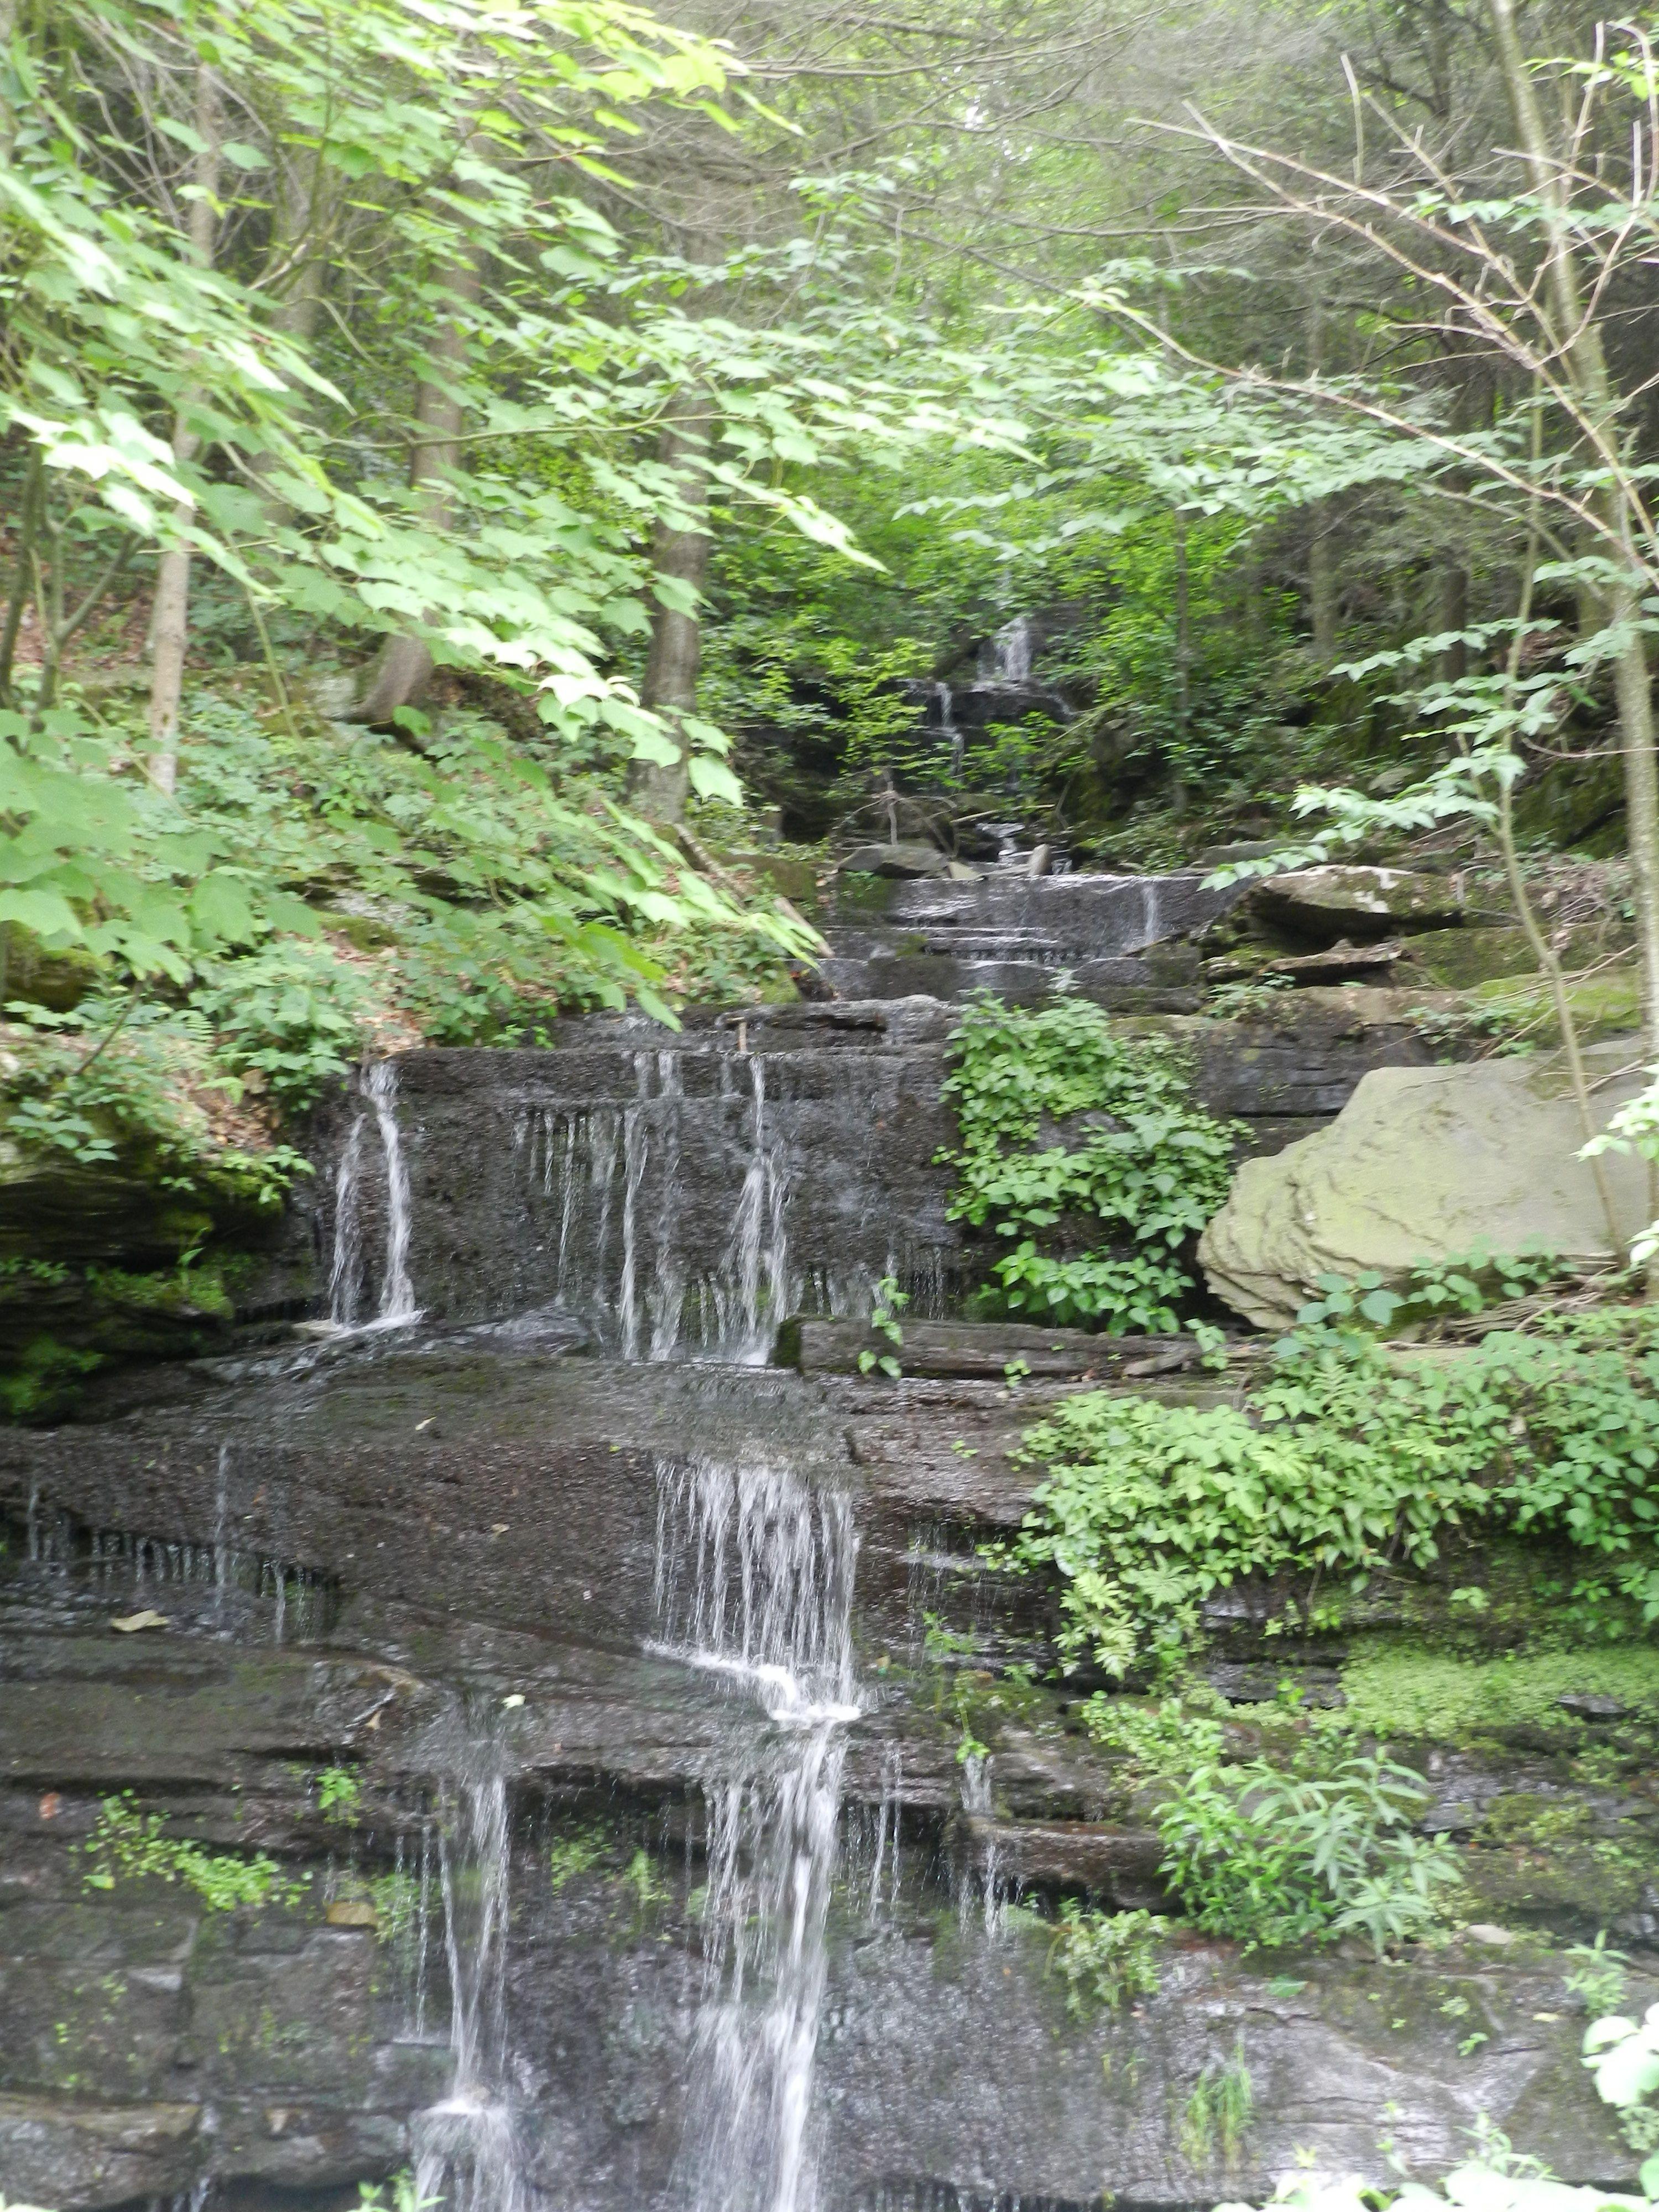 Waterfall On The Way To Sunfish Pond Leroy, Pa